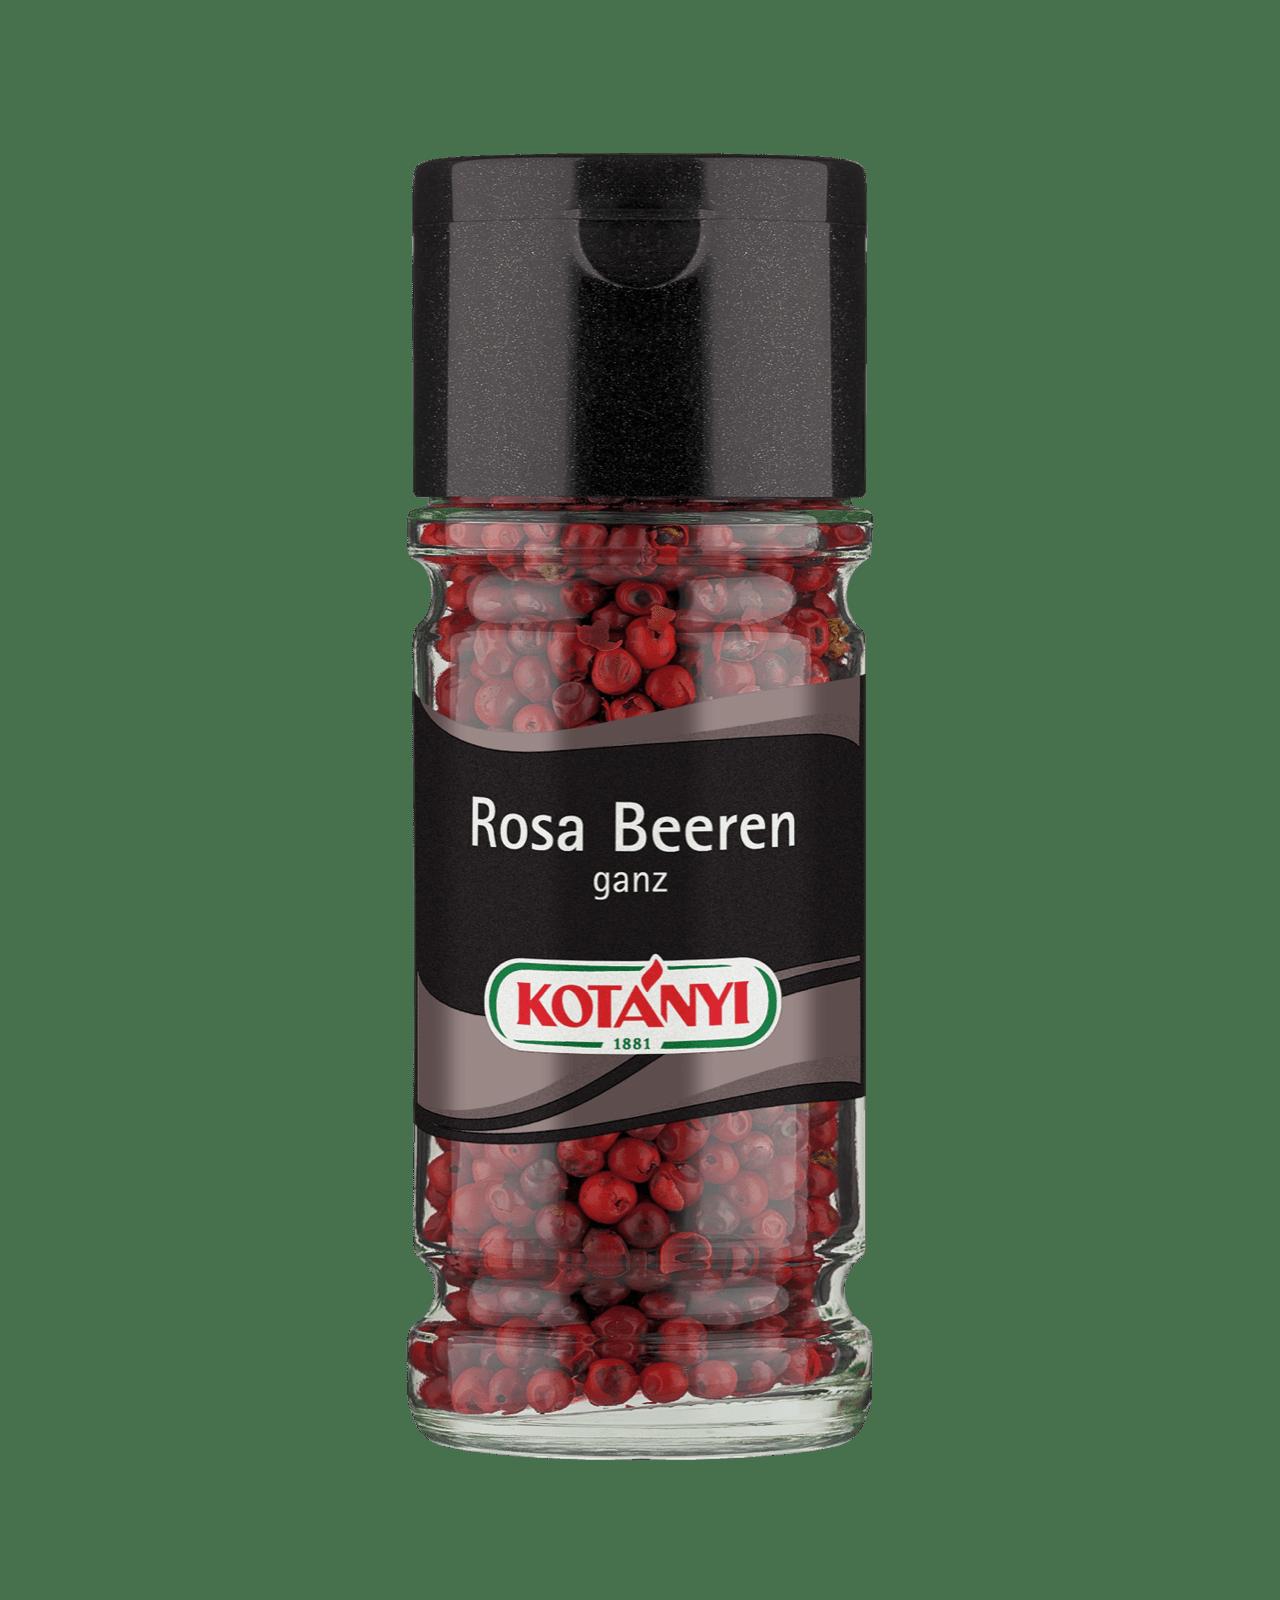 Kotányi Rosa Beeren ganz im Glas